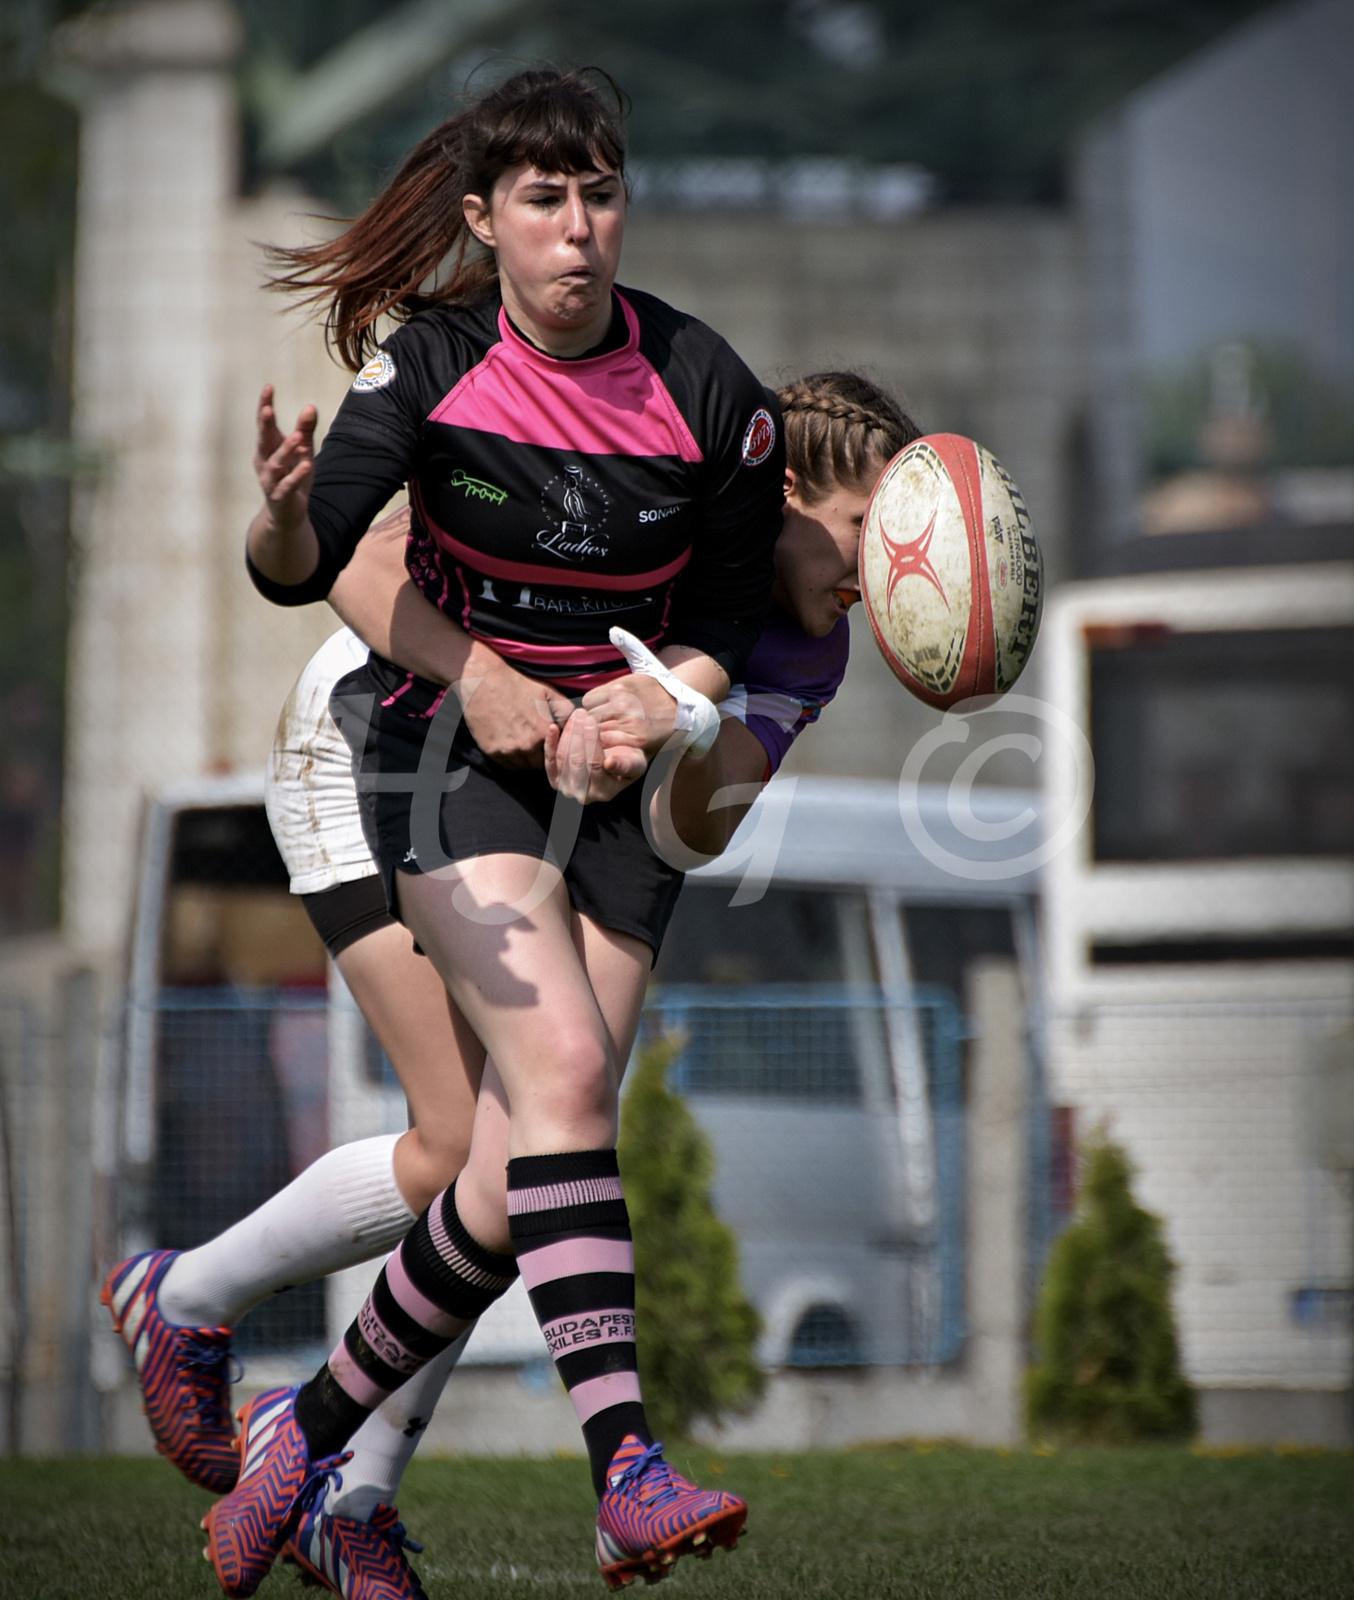 Női rugby forduló Esztergom